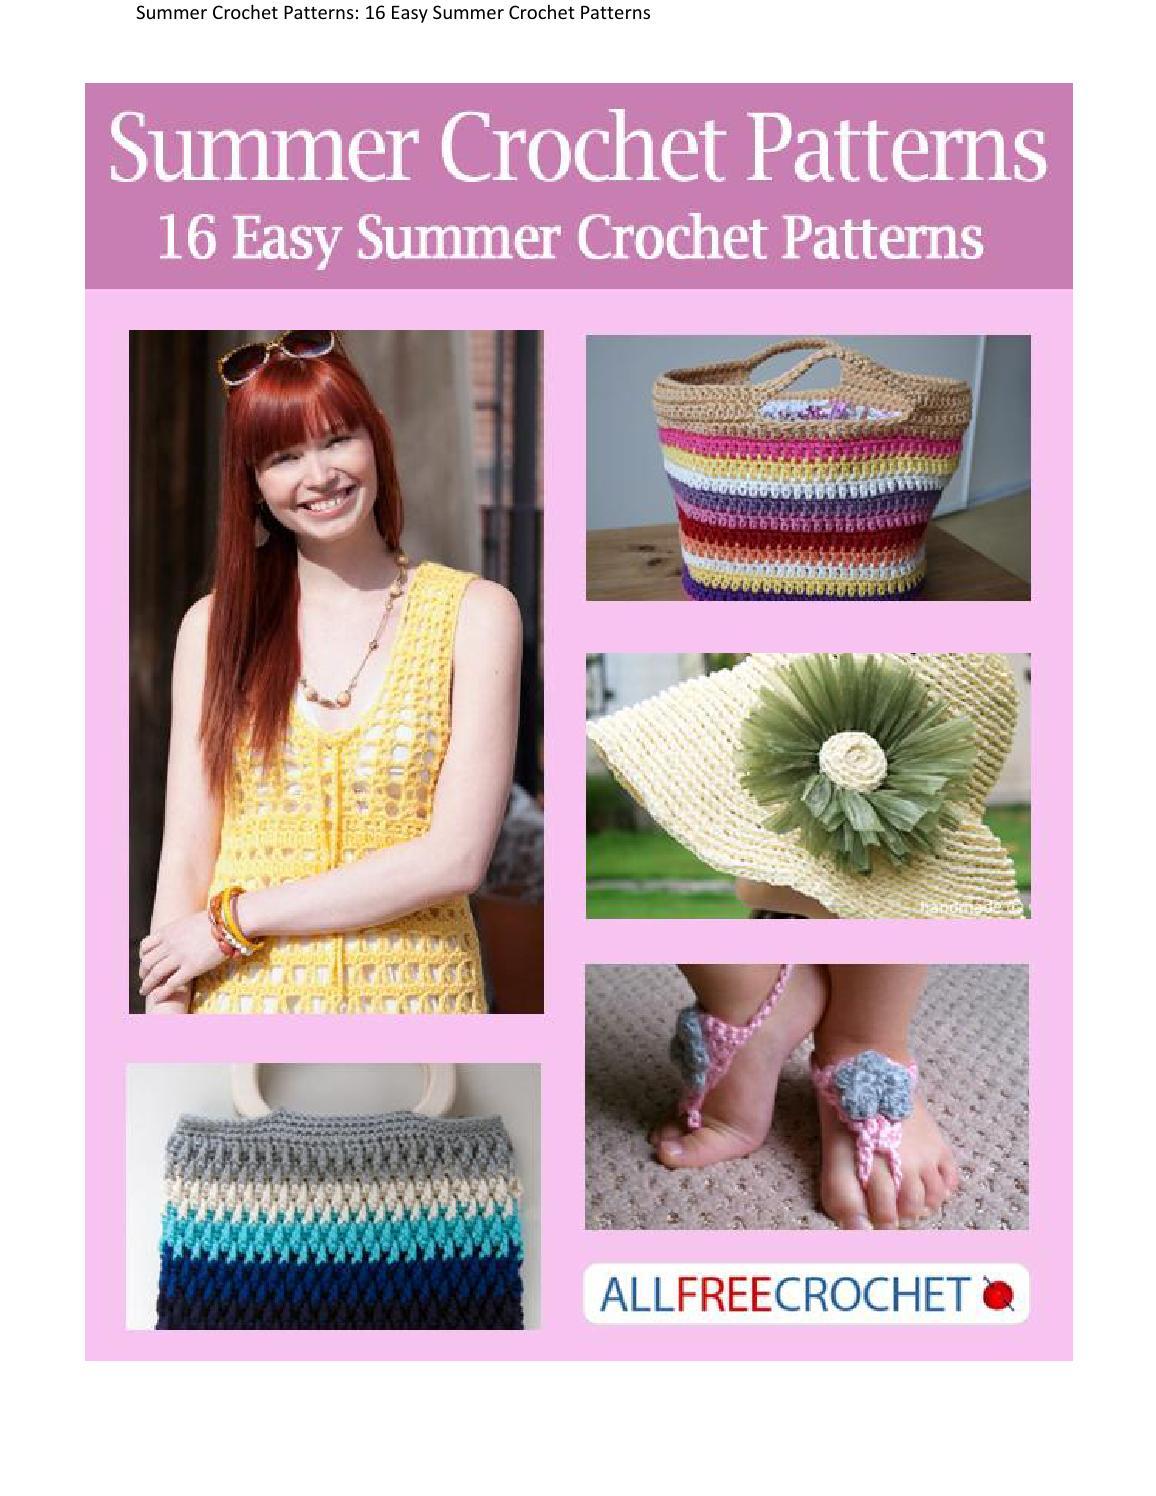 Summer Crochet Patterns 16 Easy Summer Crochet Patterns By Teresa